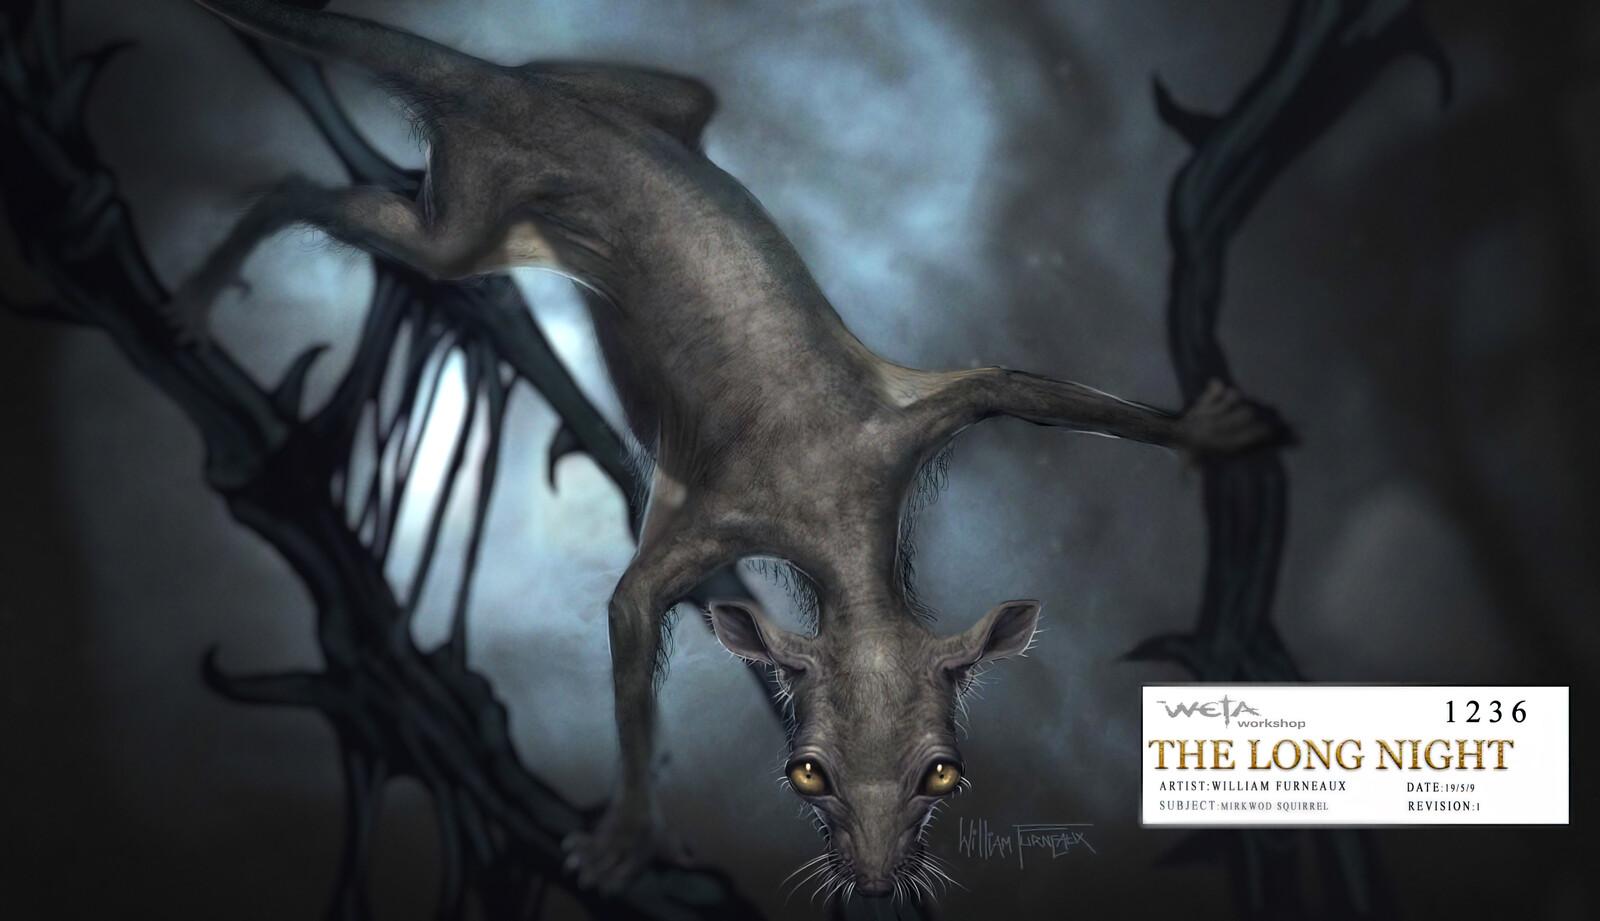 Hobbit - Mirkwood Squirrels